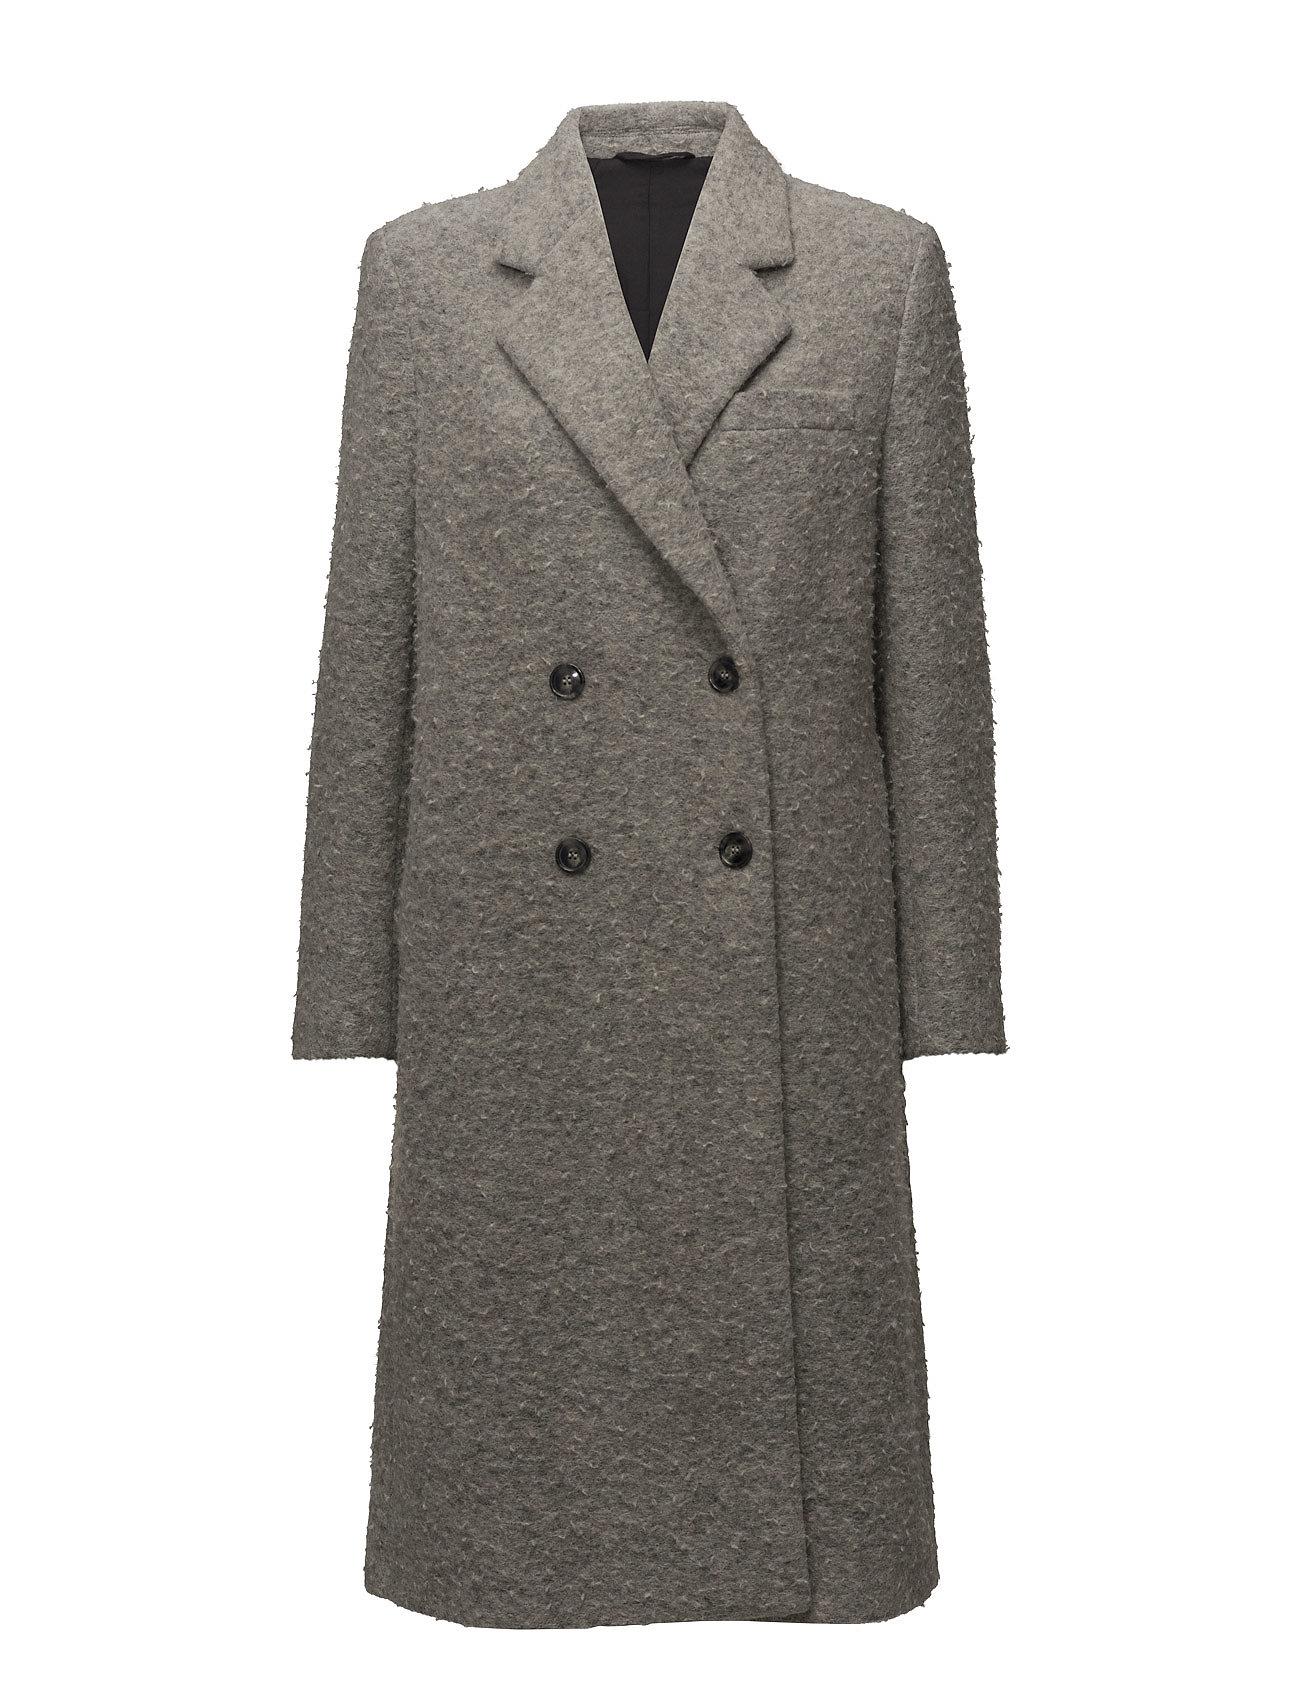 Filippa K Edine Shaggy Tailored Coat